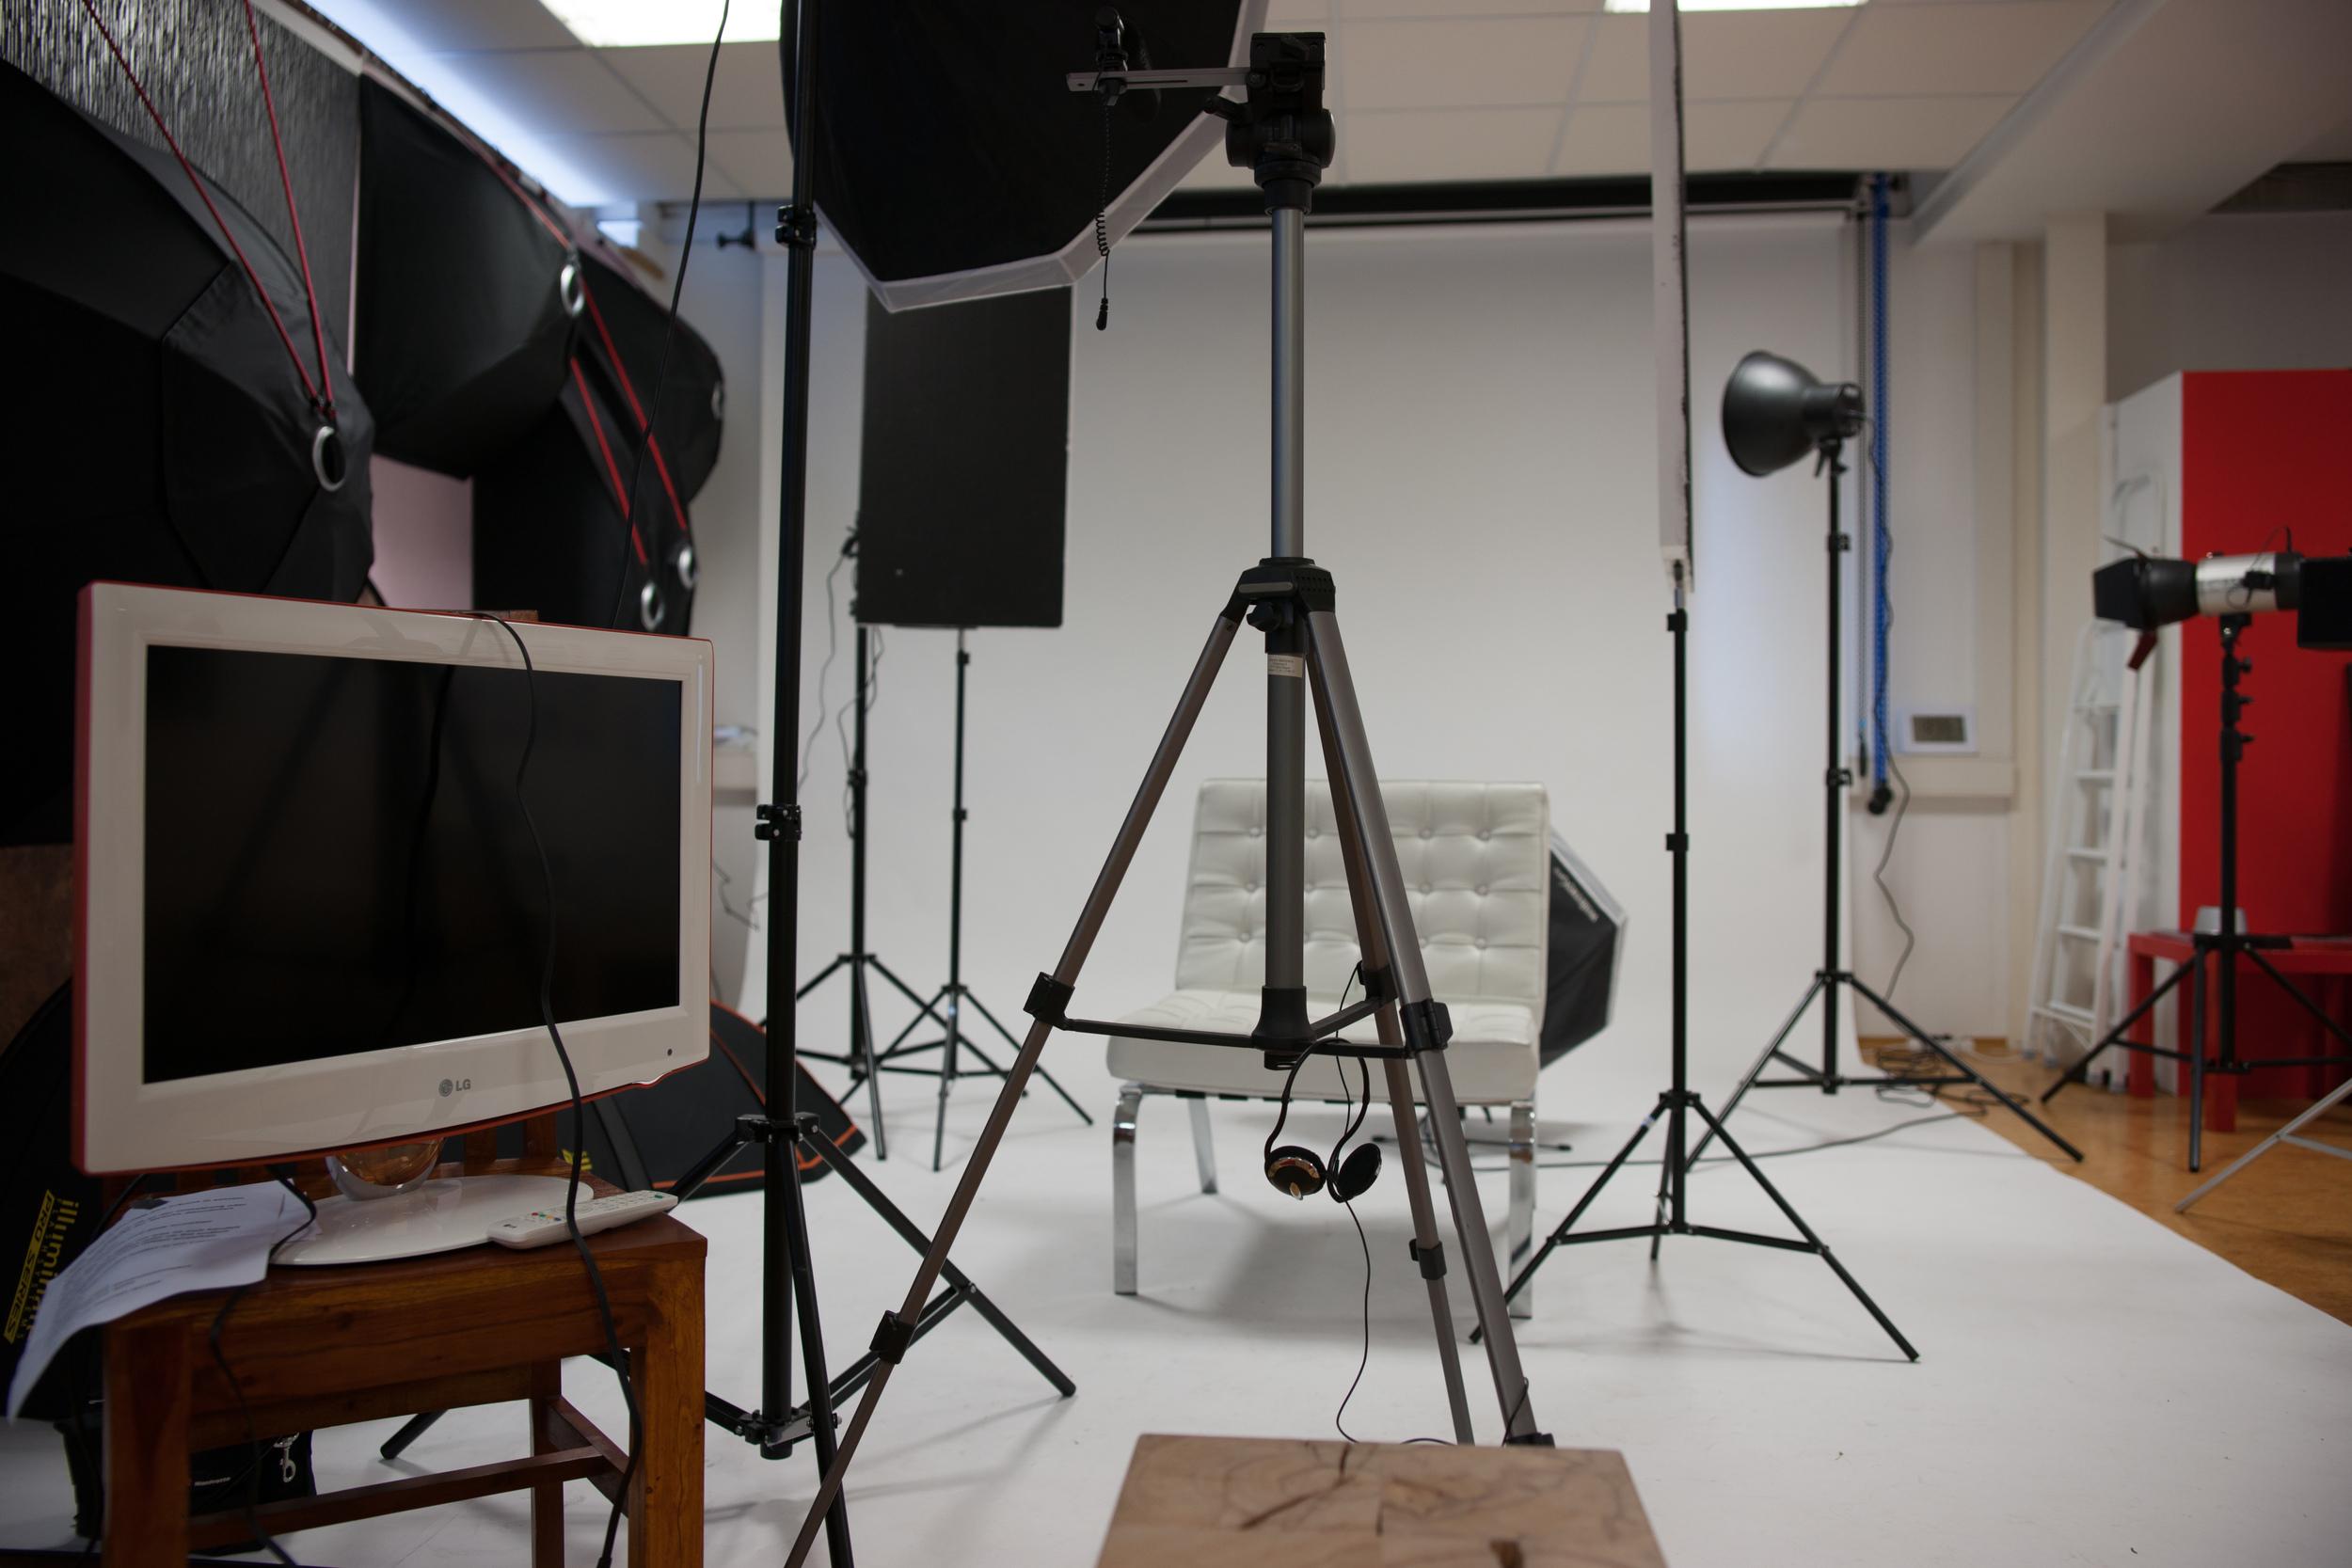 Studio beim Videoclip-Dreh